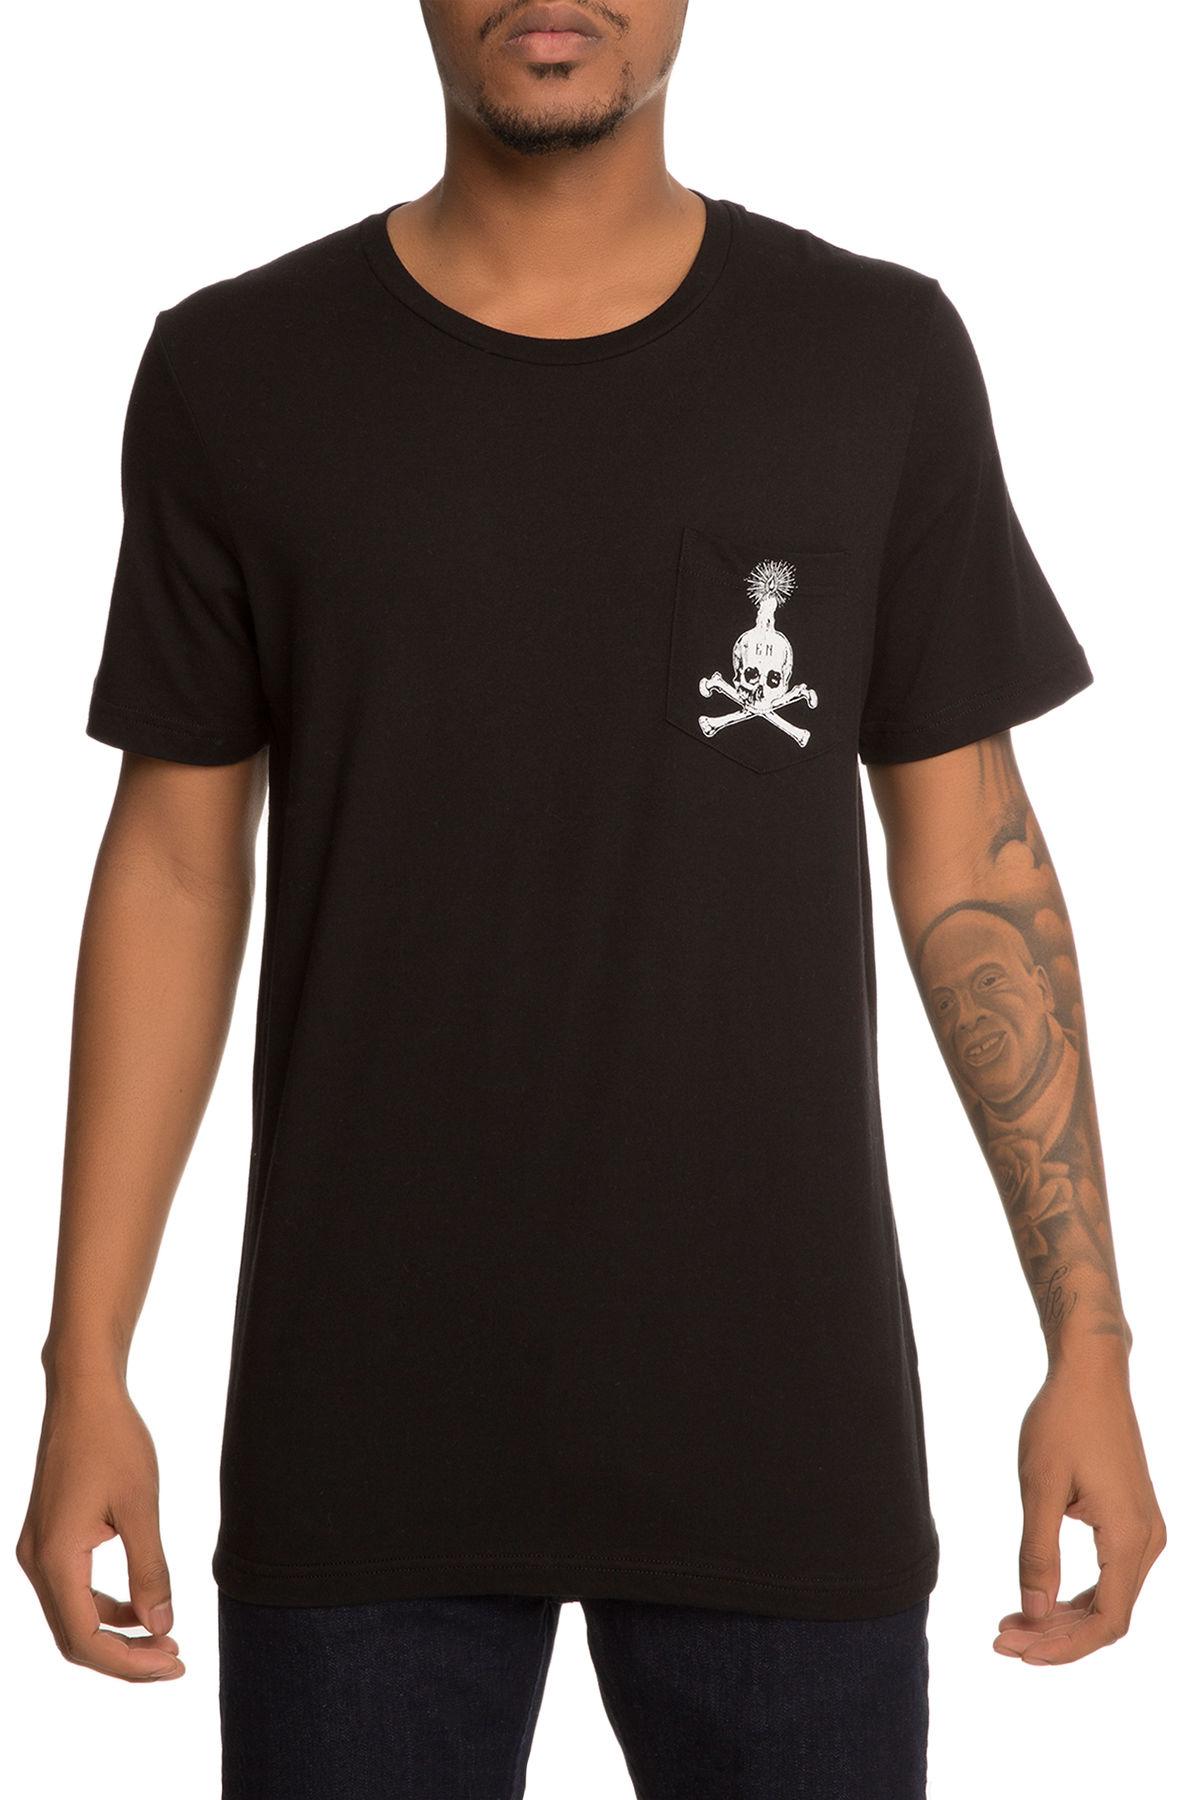 The EN x Karmaloop Skull Illuminated Pocket Tee in Black